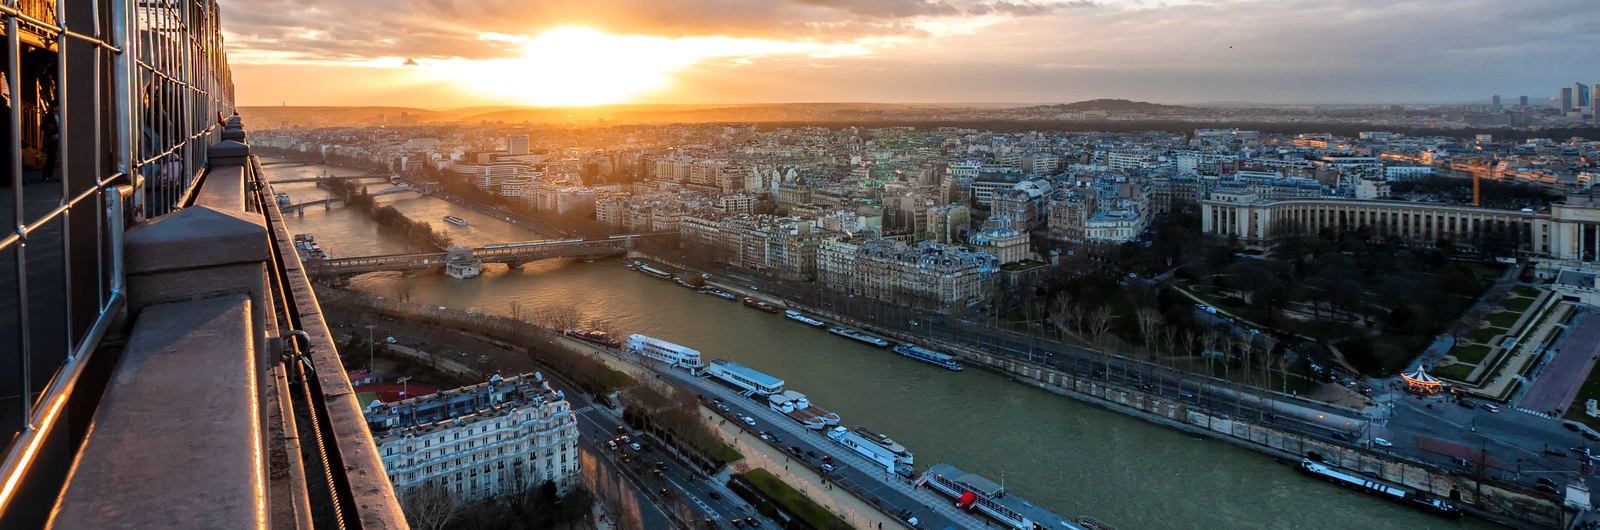 ile de france city header